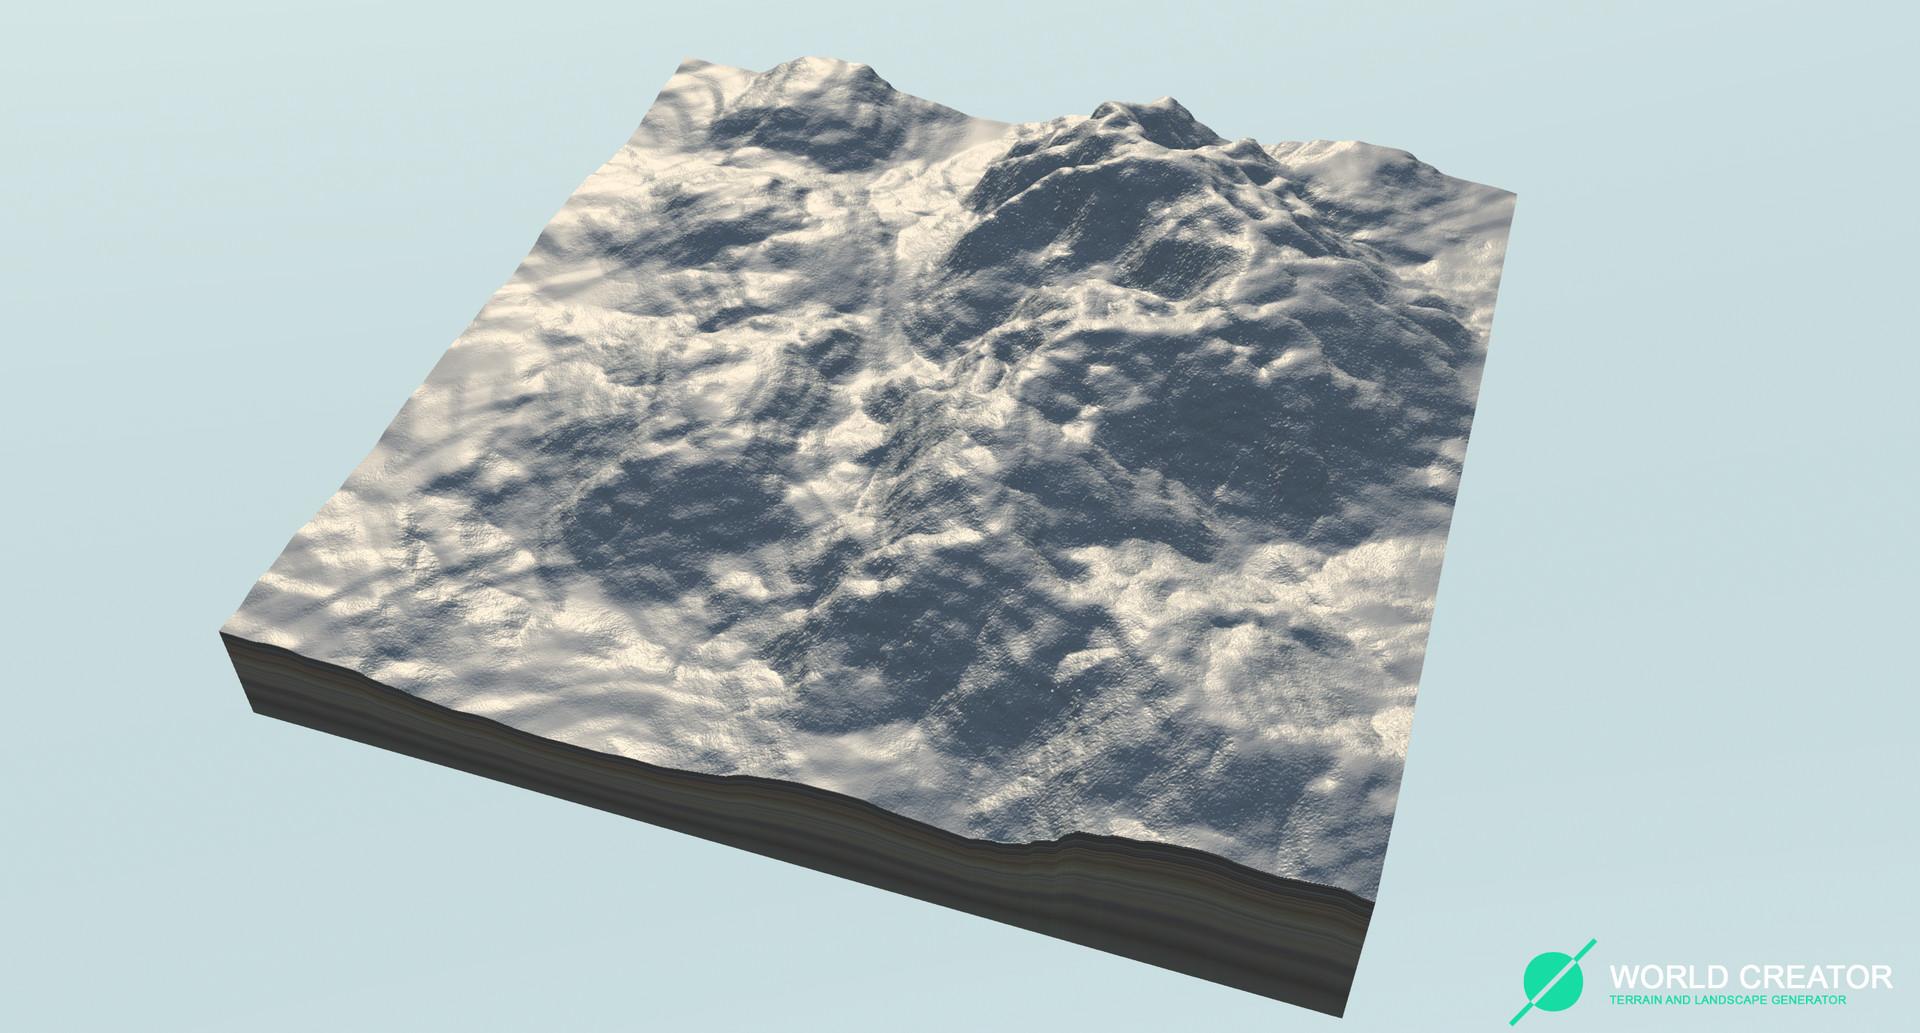 Summary -> World Creator A Procedural Terrain And Landscape